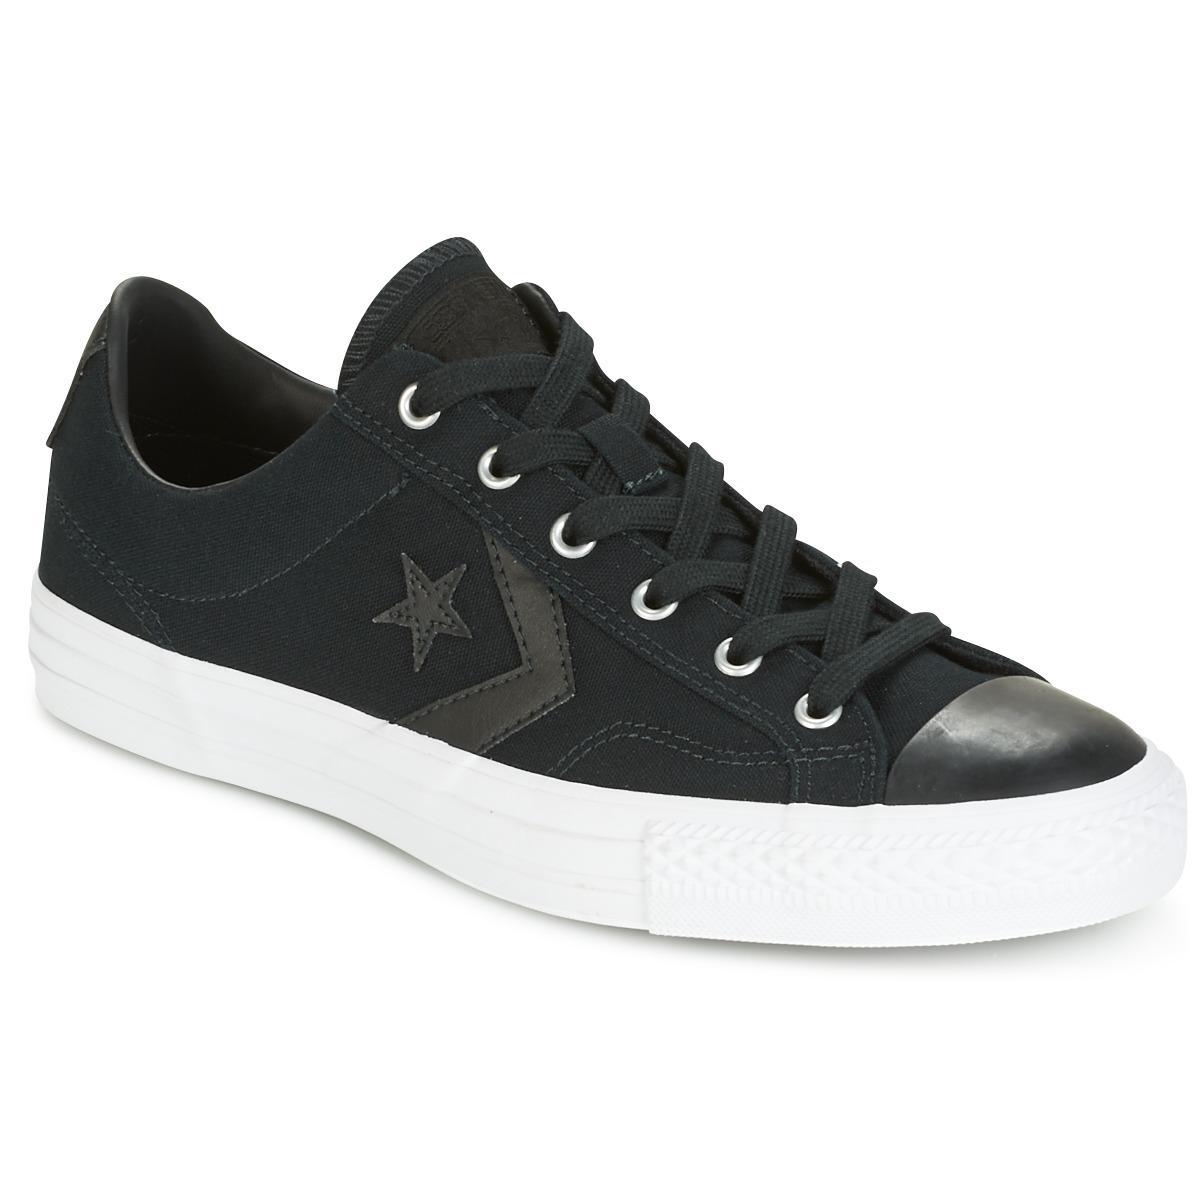 a64e80cde60 Converse. Star Player Canvas With Gum Ox Black black white Men s ...